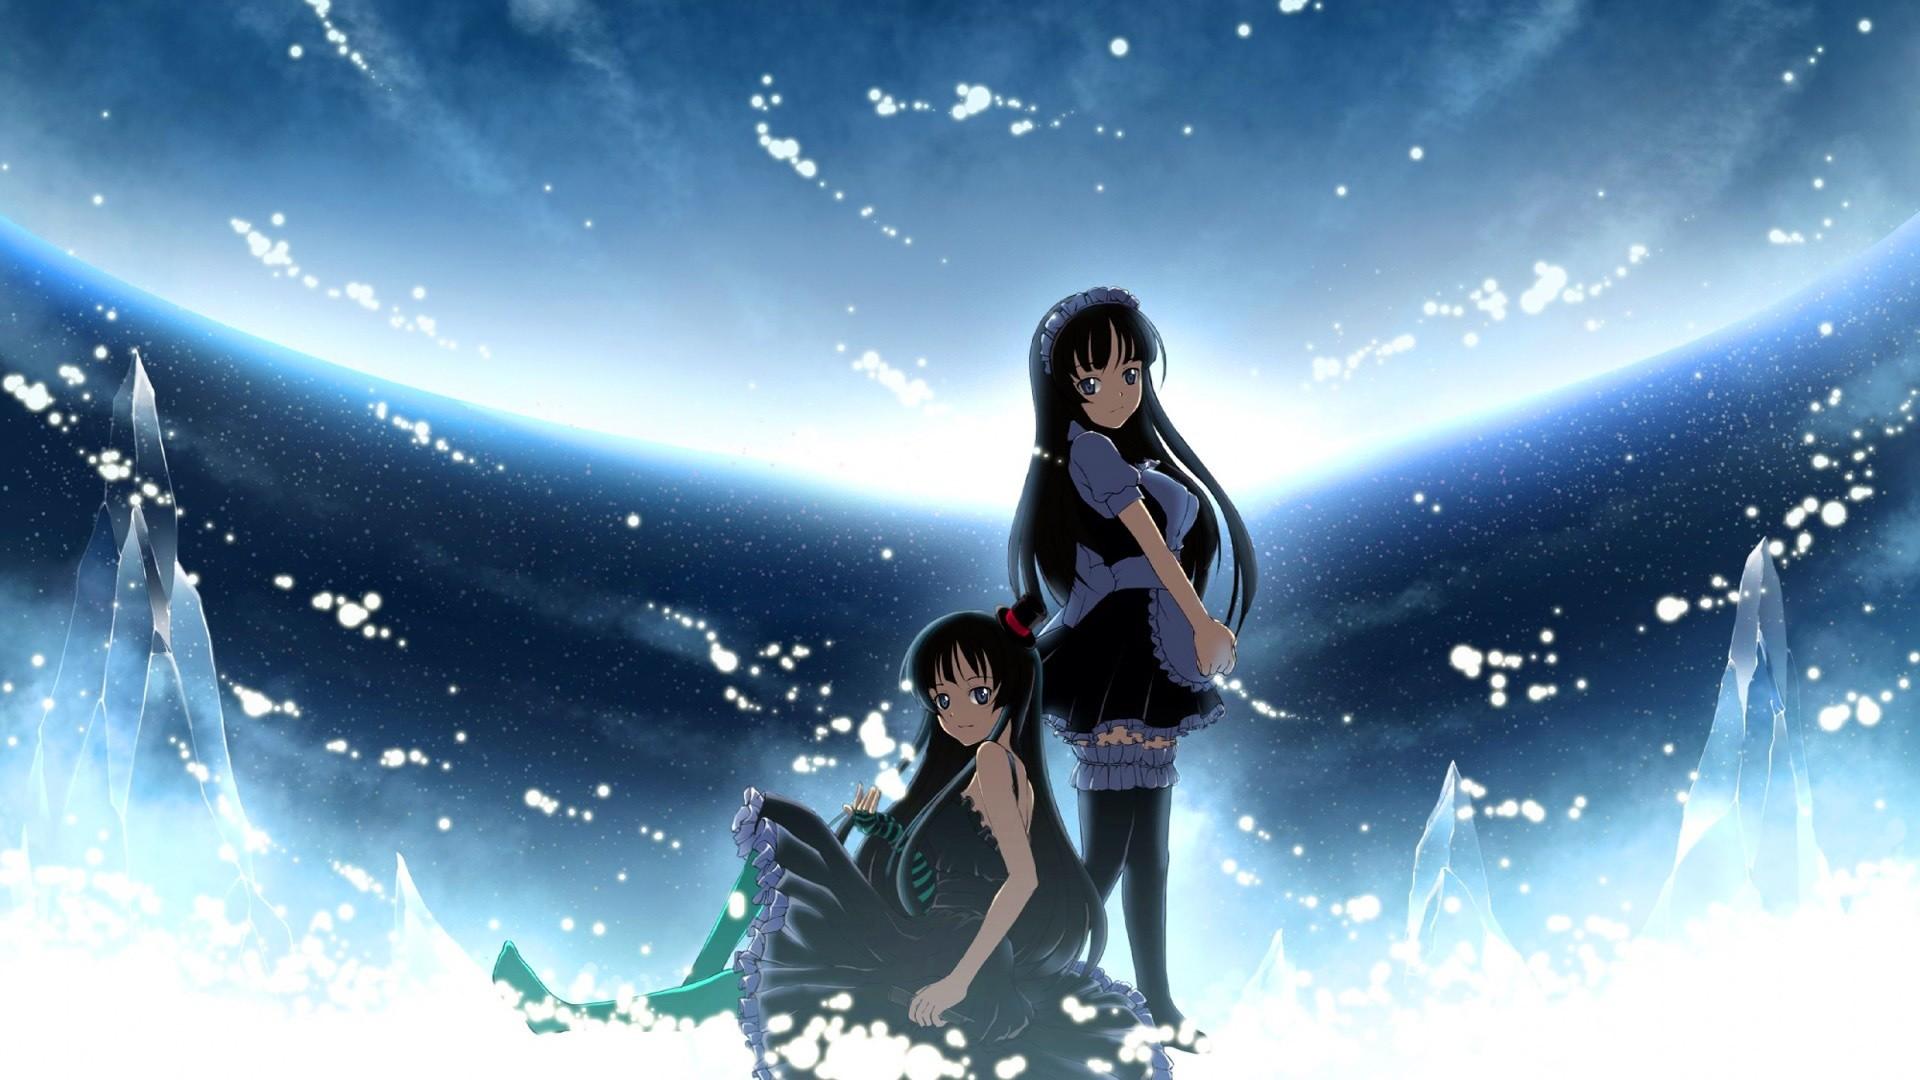 1080 HD Anime Wallpaper | Download HD Wallpapers